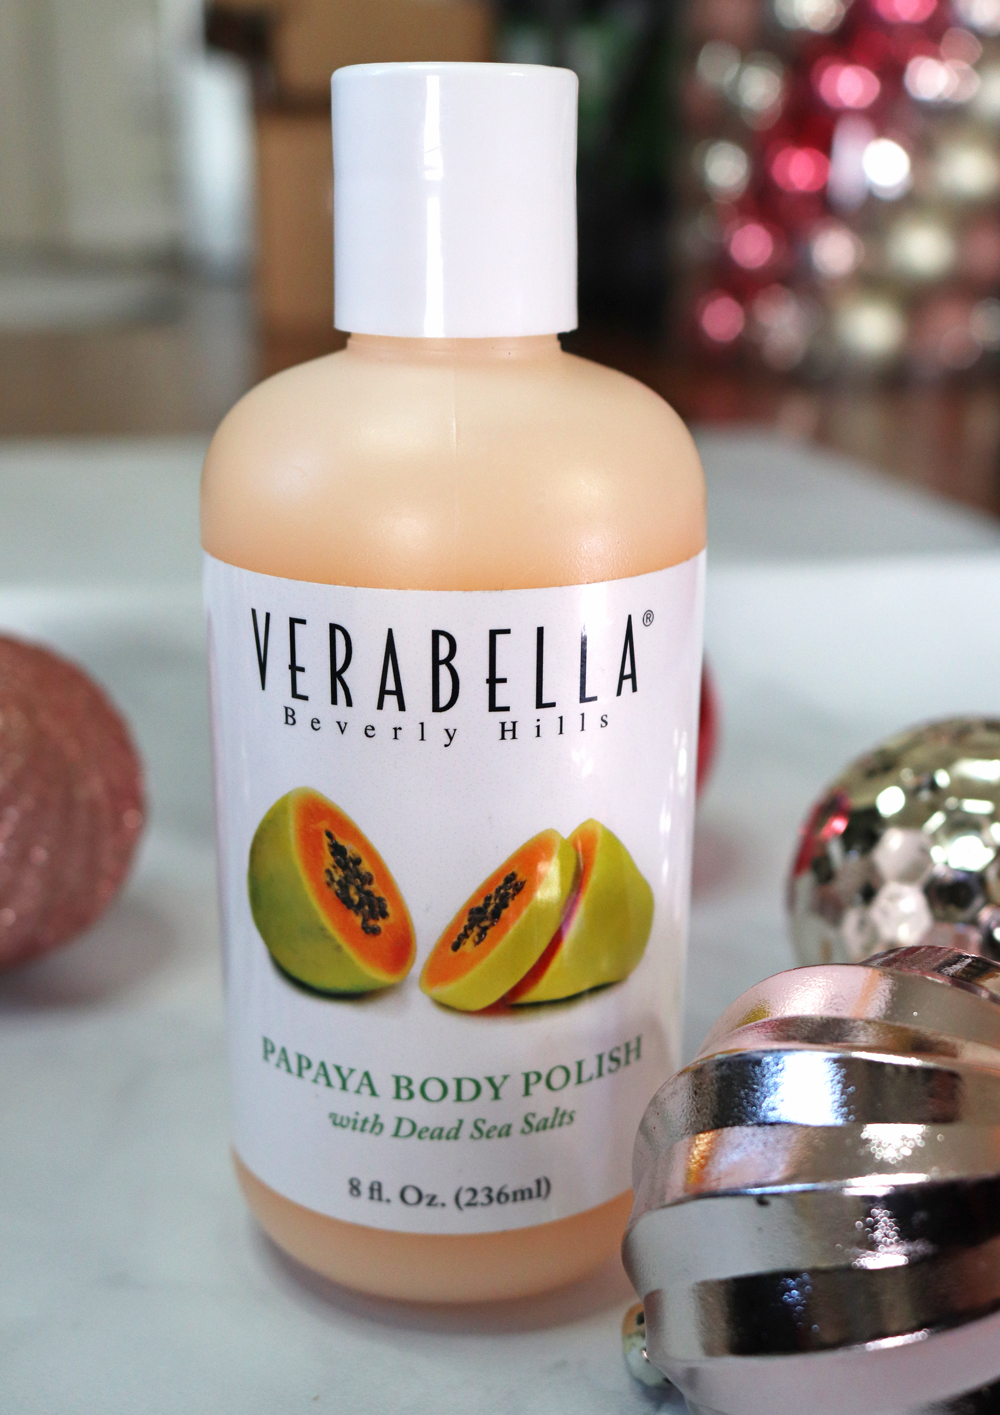 Cruelty Free Holiday Gift Guide 2020 - Verabella Papaya Body Polish